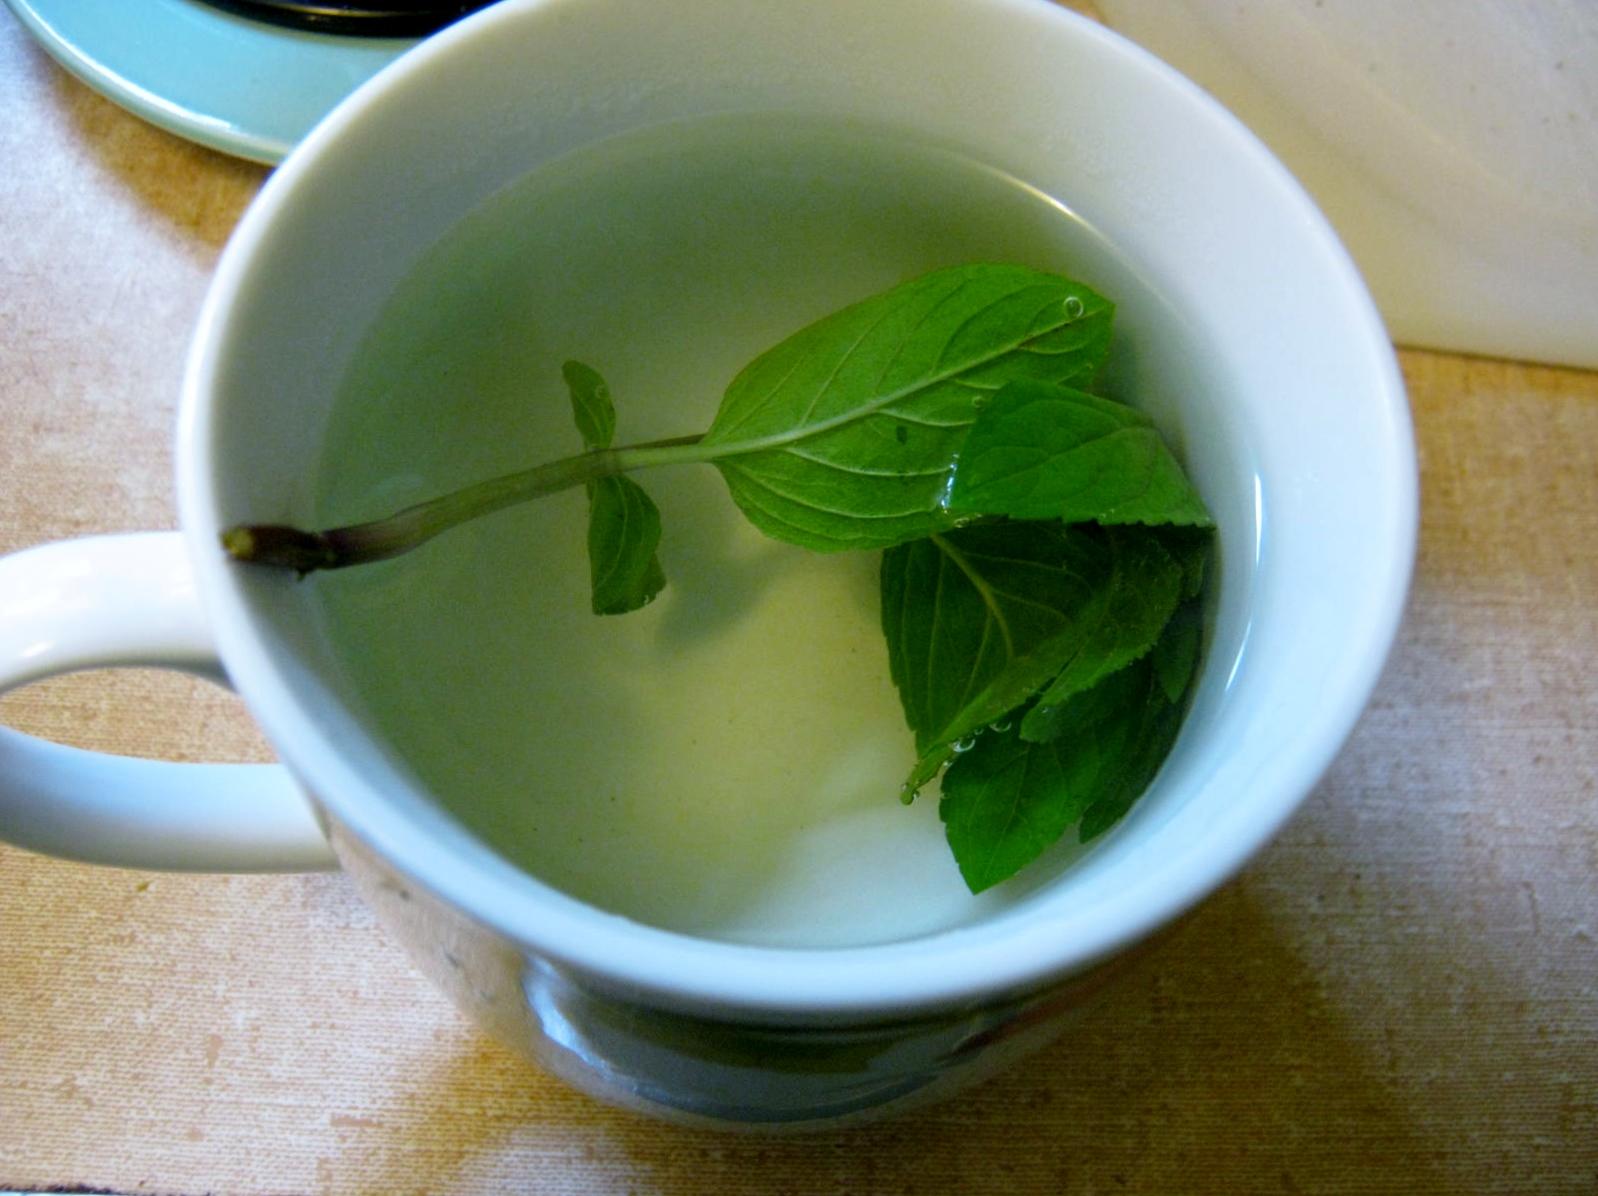 Spearamint tea